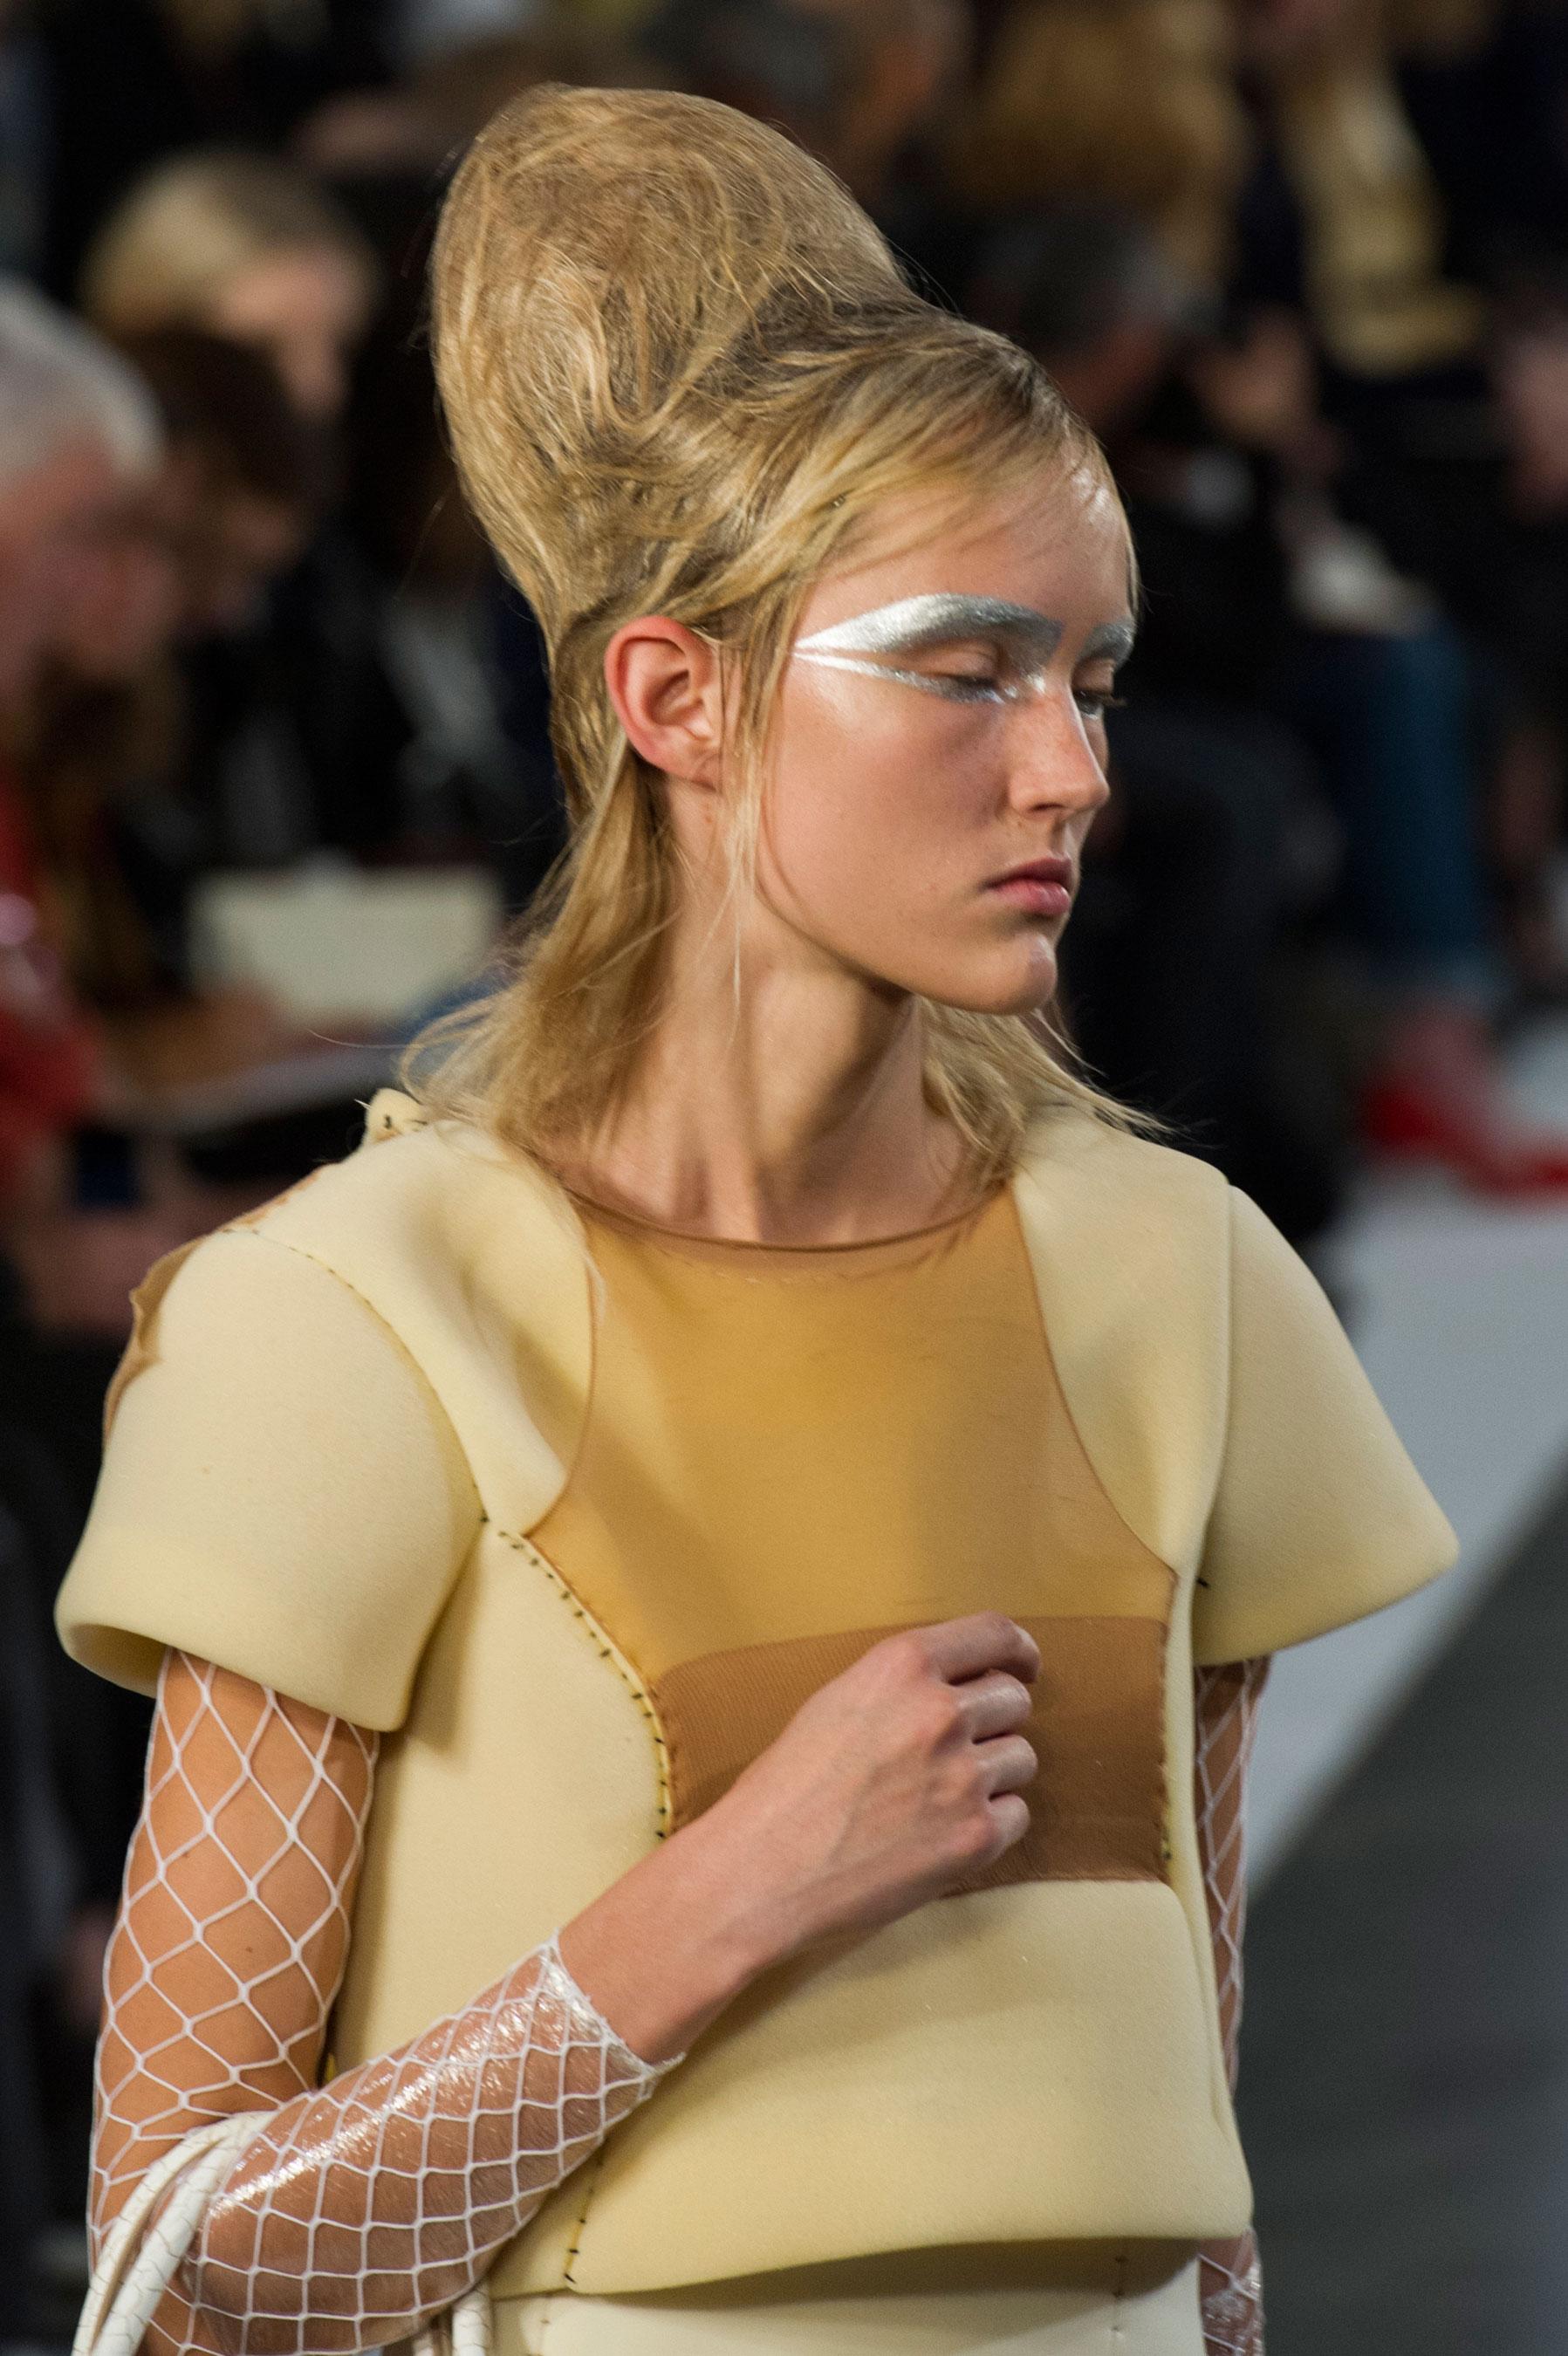 Maison-Margiela-spring-2016-runway-beauty-fashion-show-the-impression-097